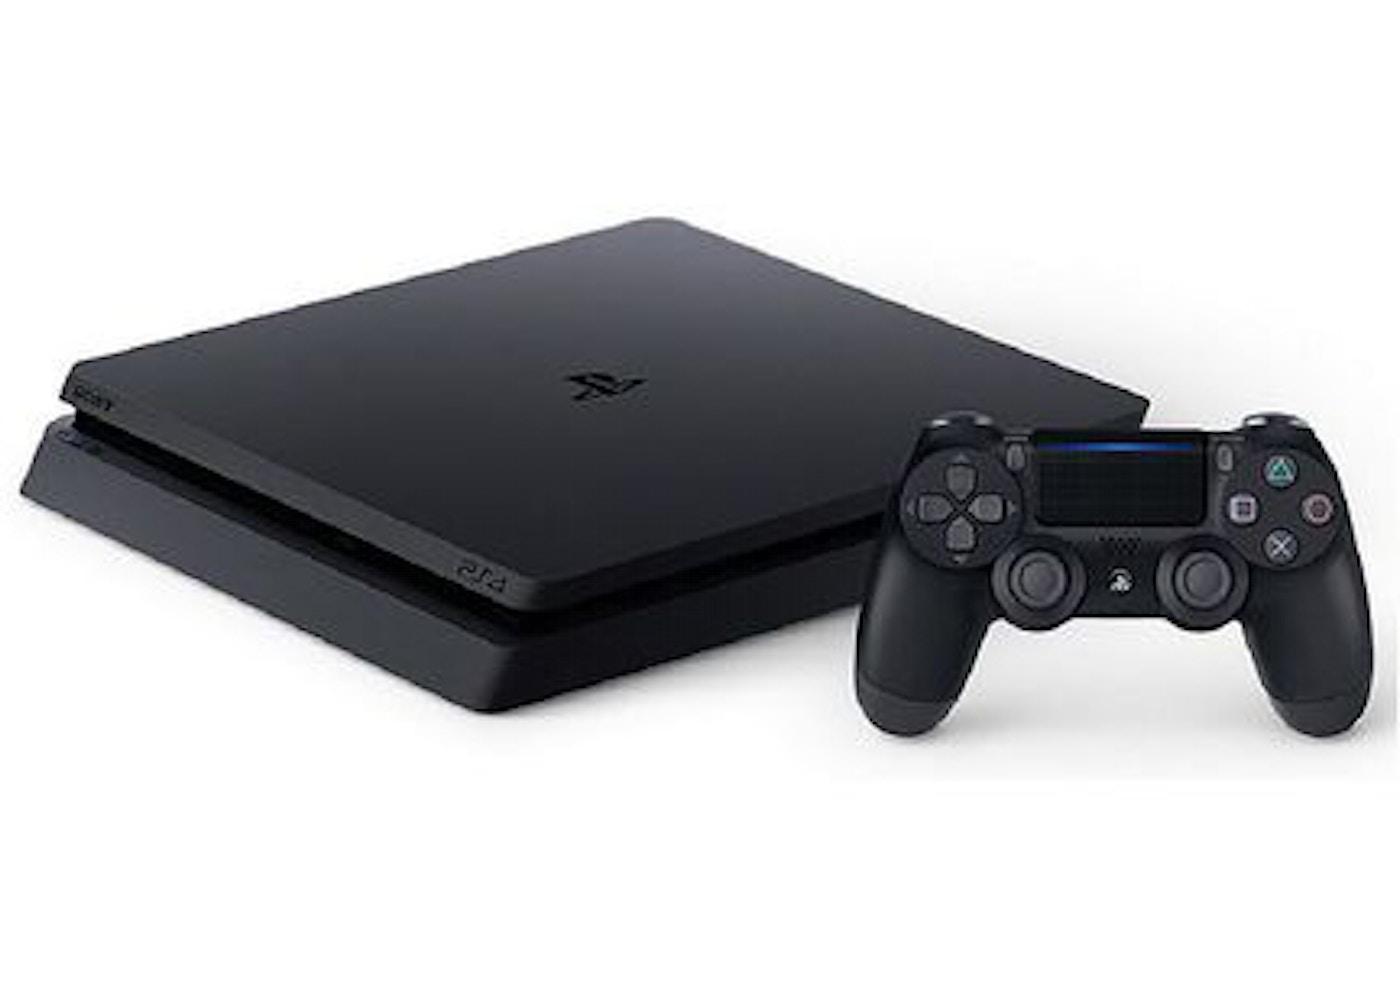 Sony PS4 PlayStation 4 Slim 1TB Console 3 Game Bundle Jet Black (CUH-2215B)  US Plug -